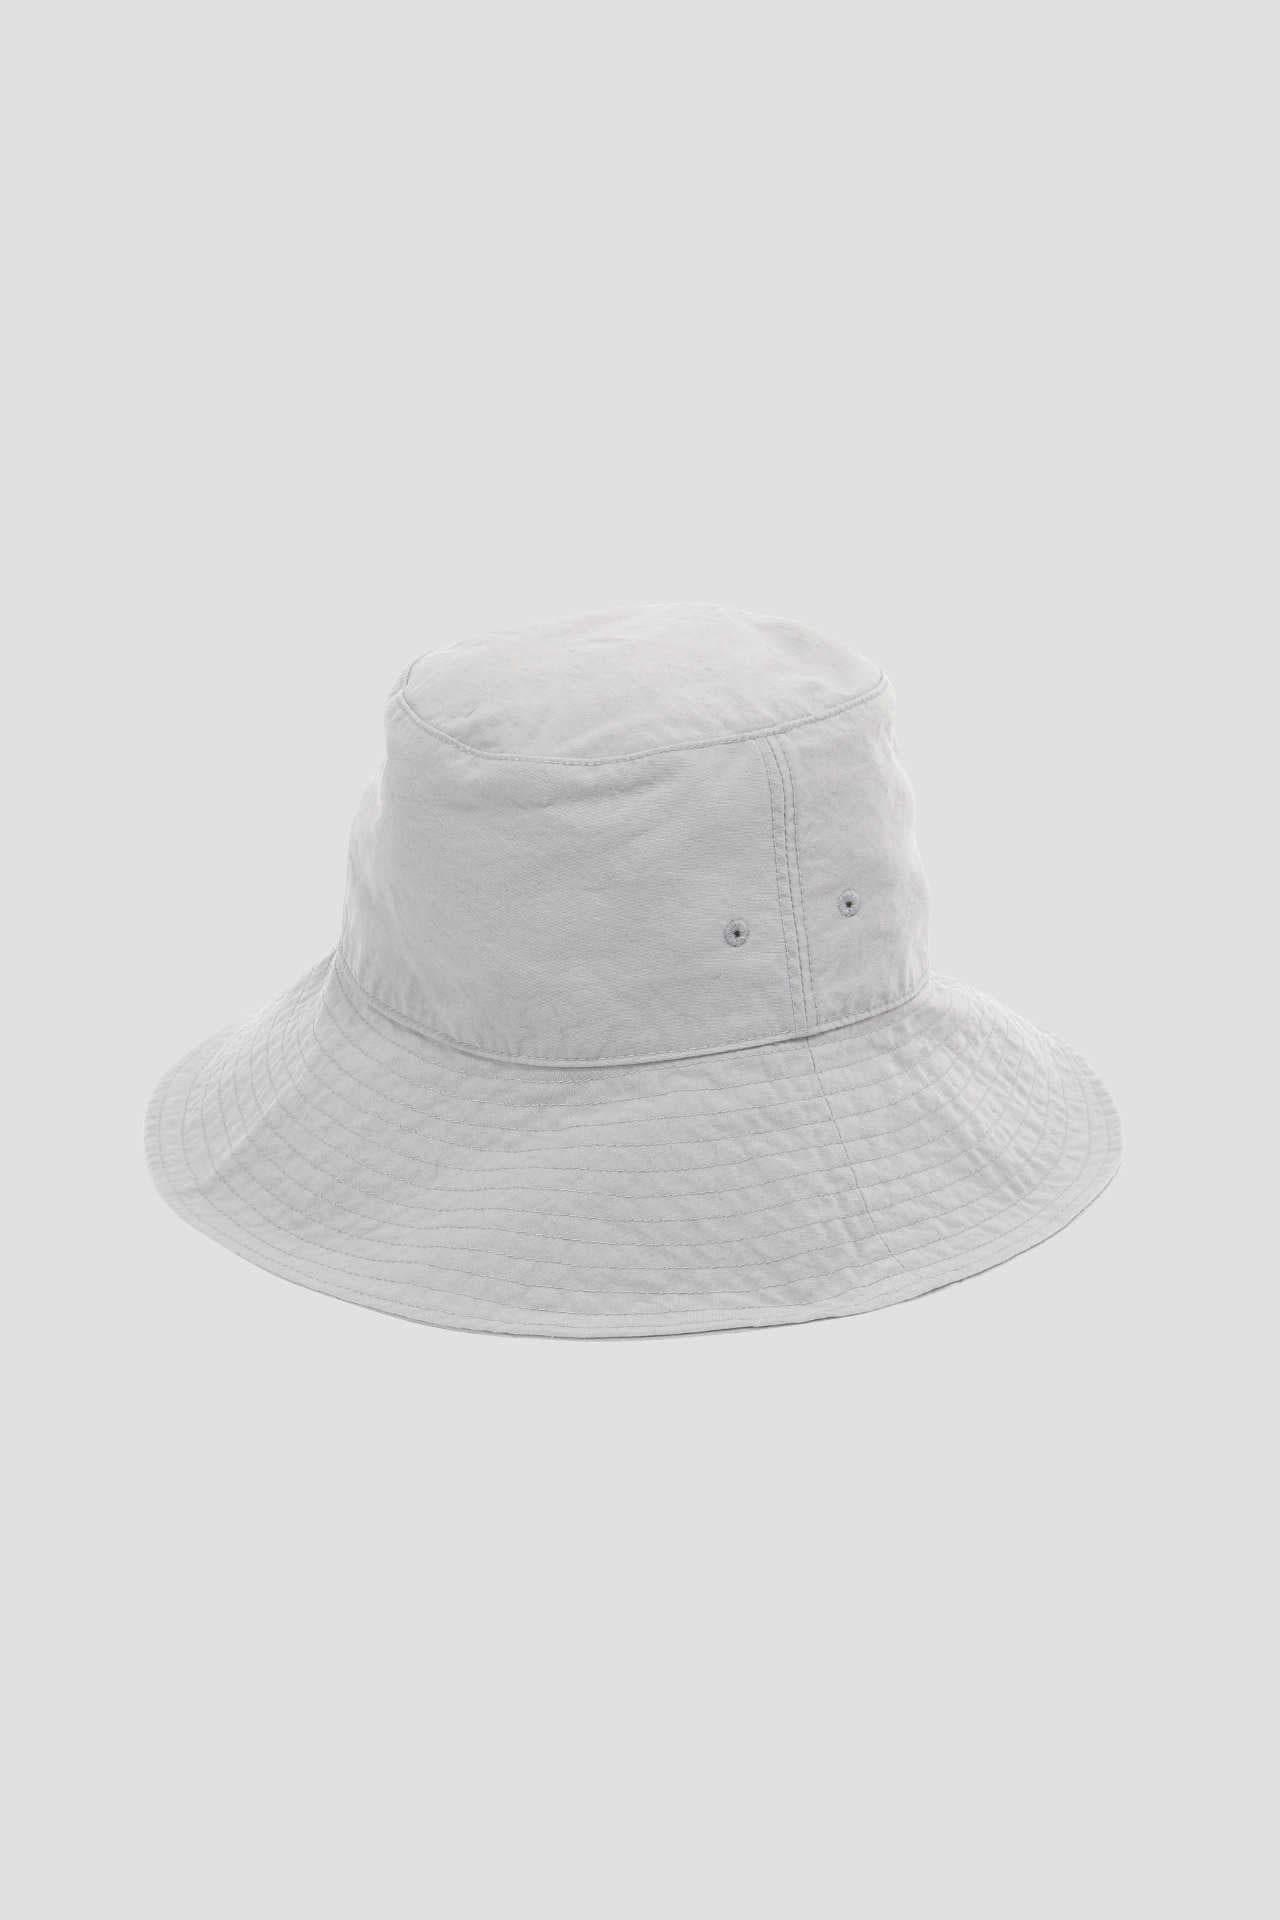 NYLON GARDEN HAT6